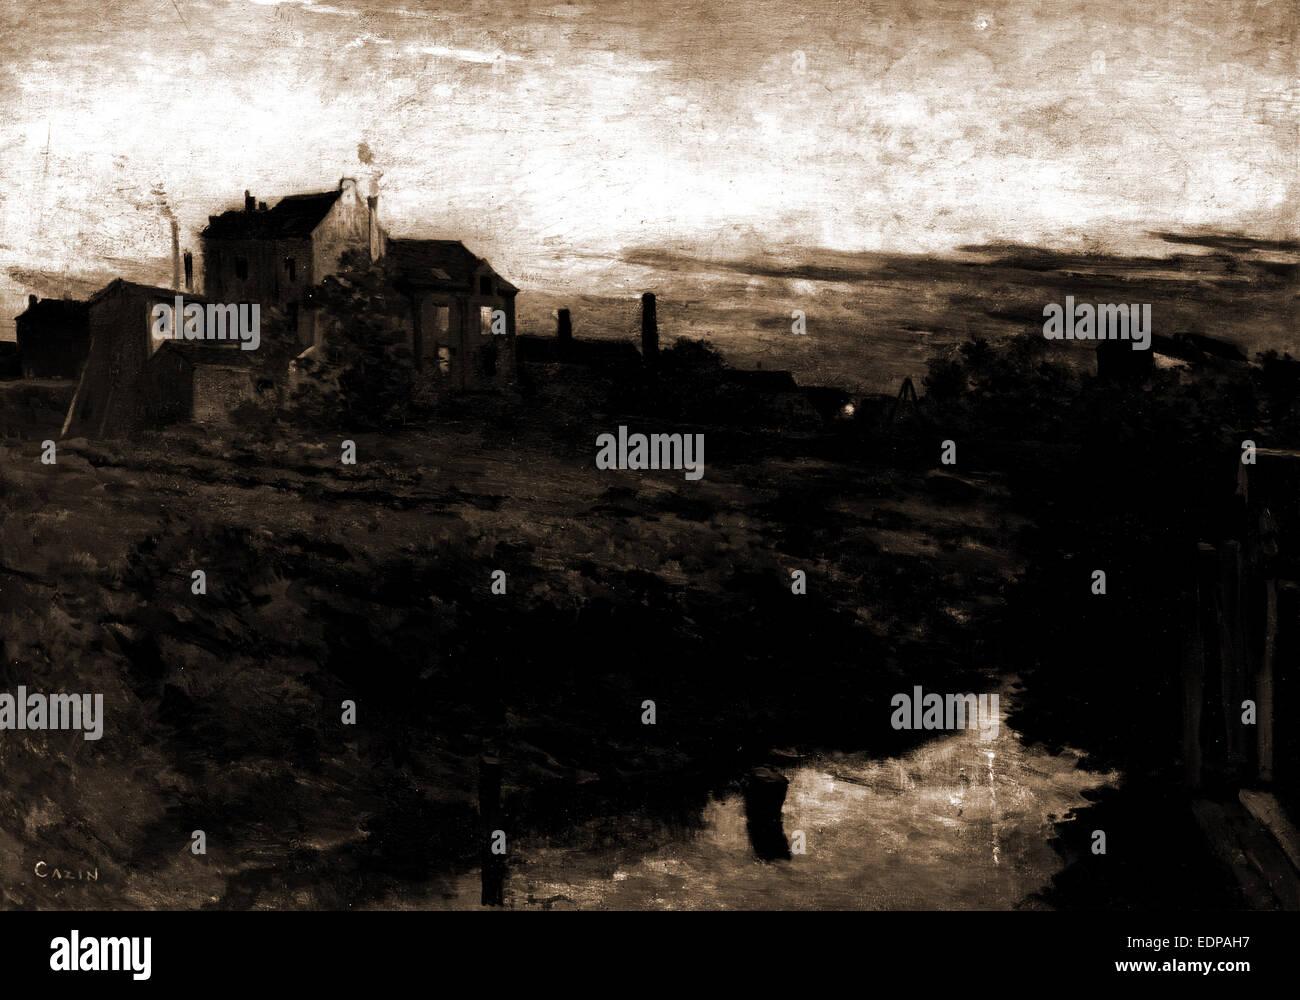 A suburb of Antwerp, Cazin, Jean Charles, 1841-1901, Waterfronts, Dwellings, Belgium, Antwerp, 1900 - Stock Image